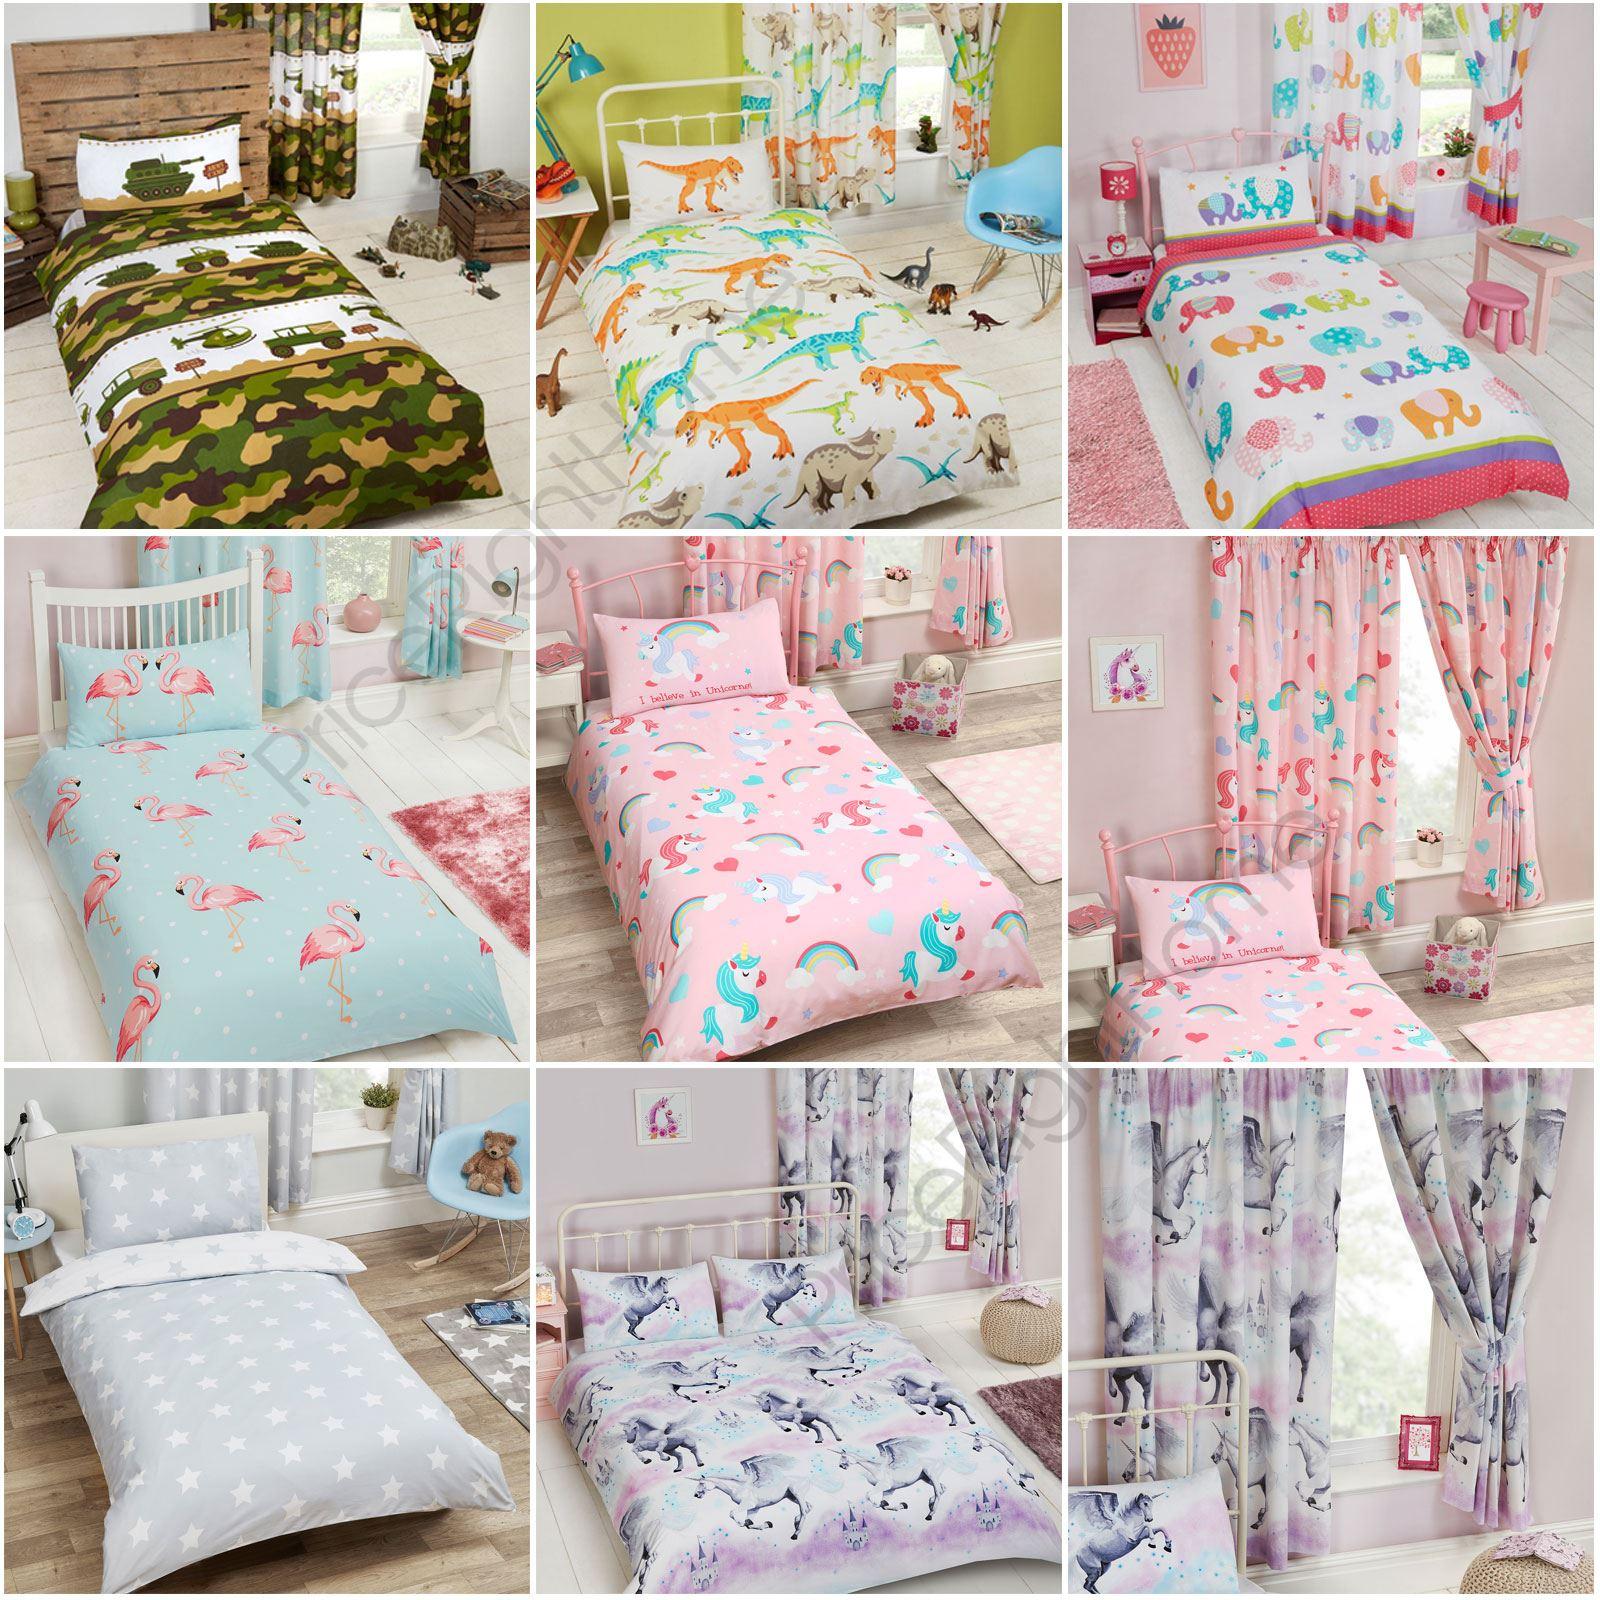 Childrens Matching Duvet Cover Sets Curtains Wallpaper